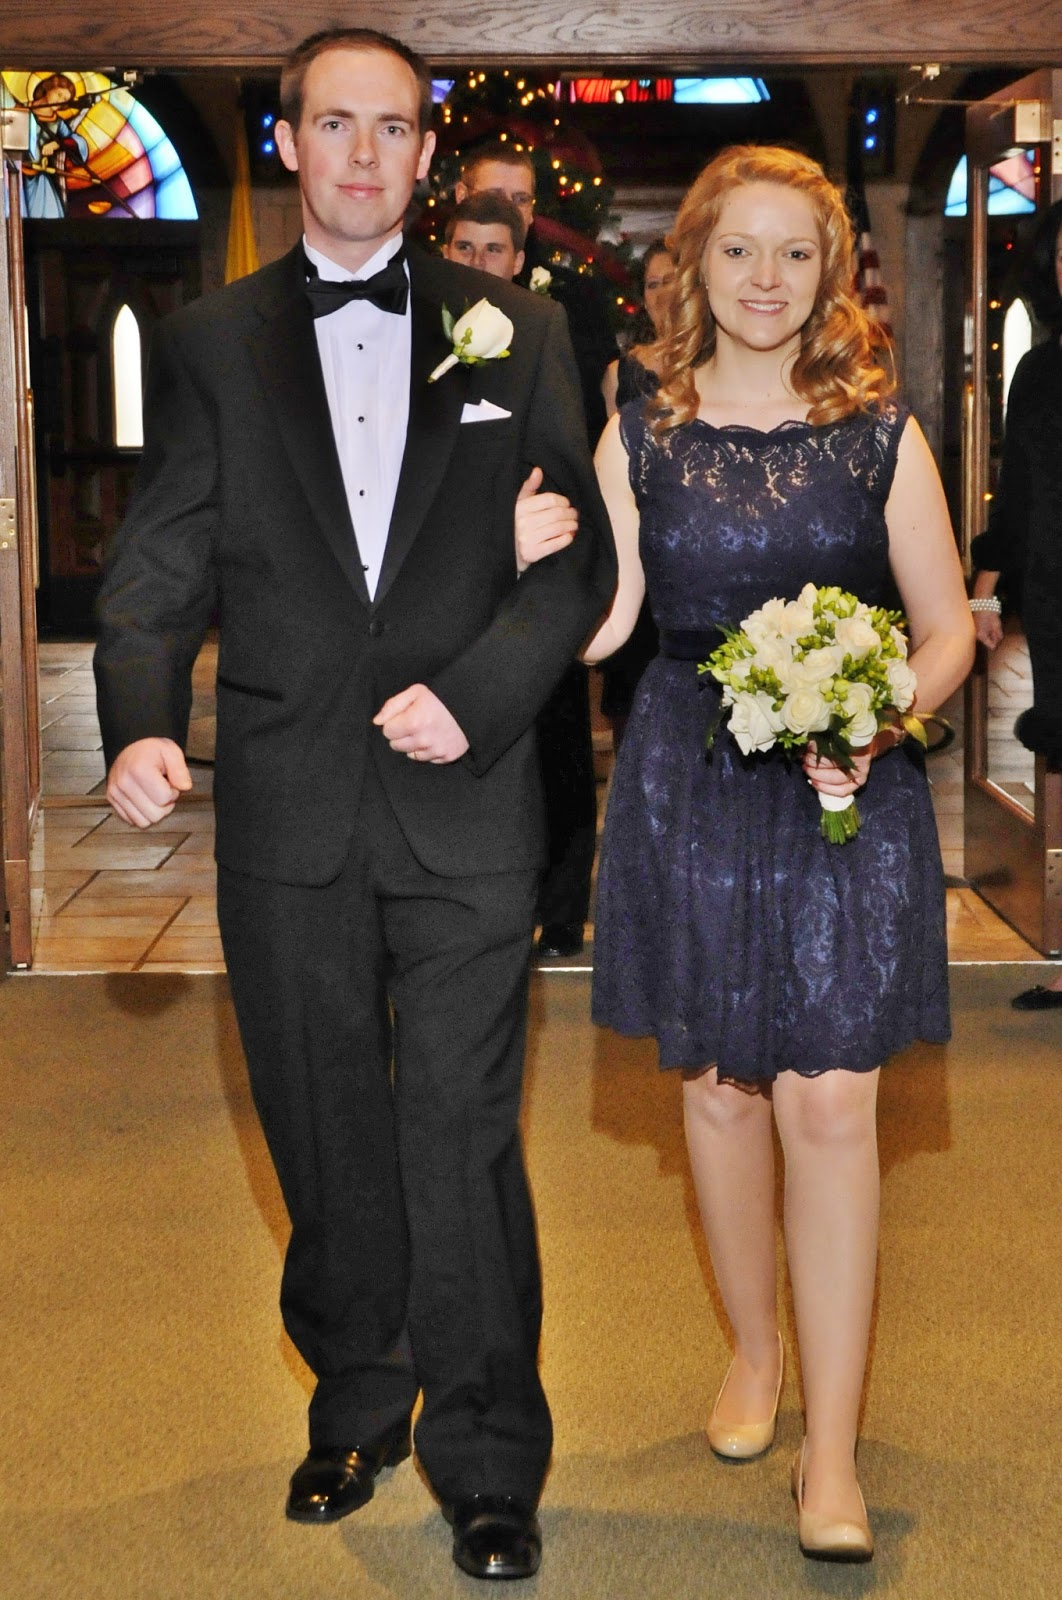 Wedding dress refashion games